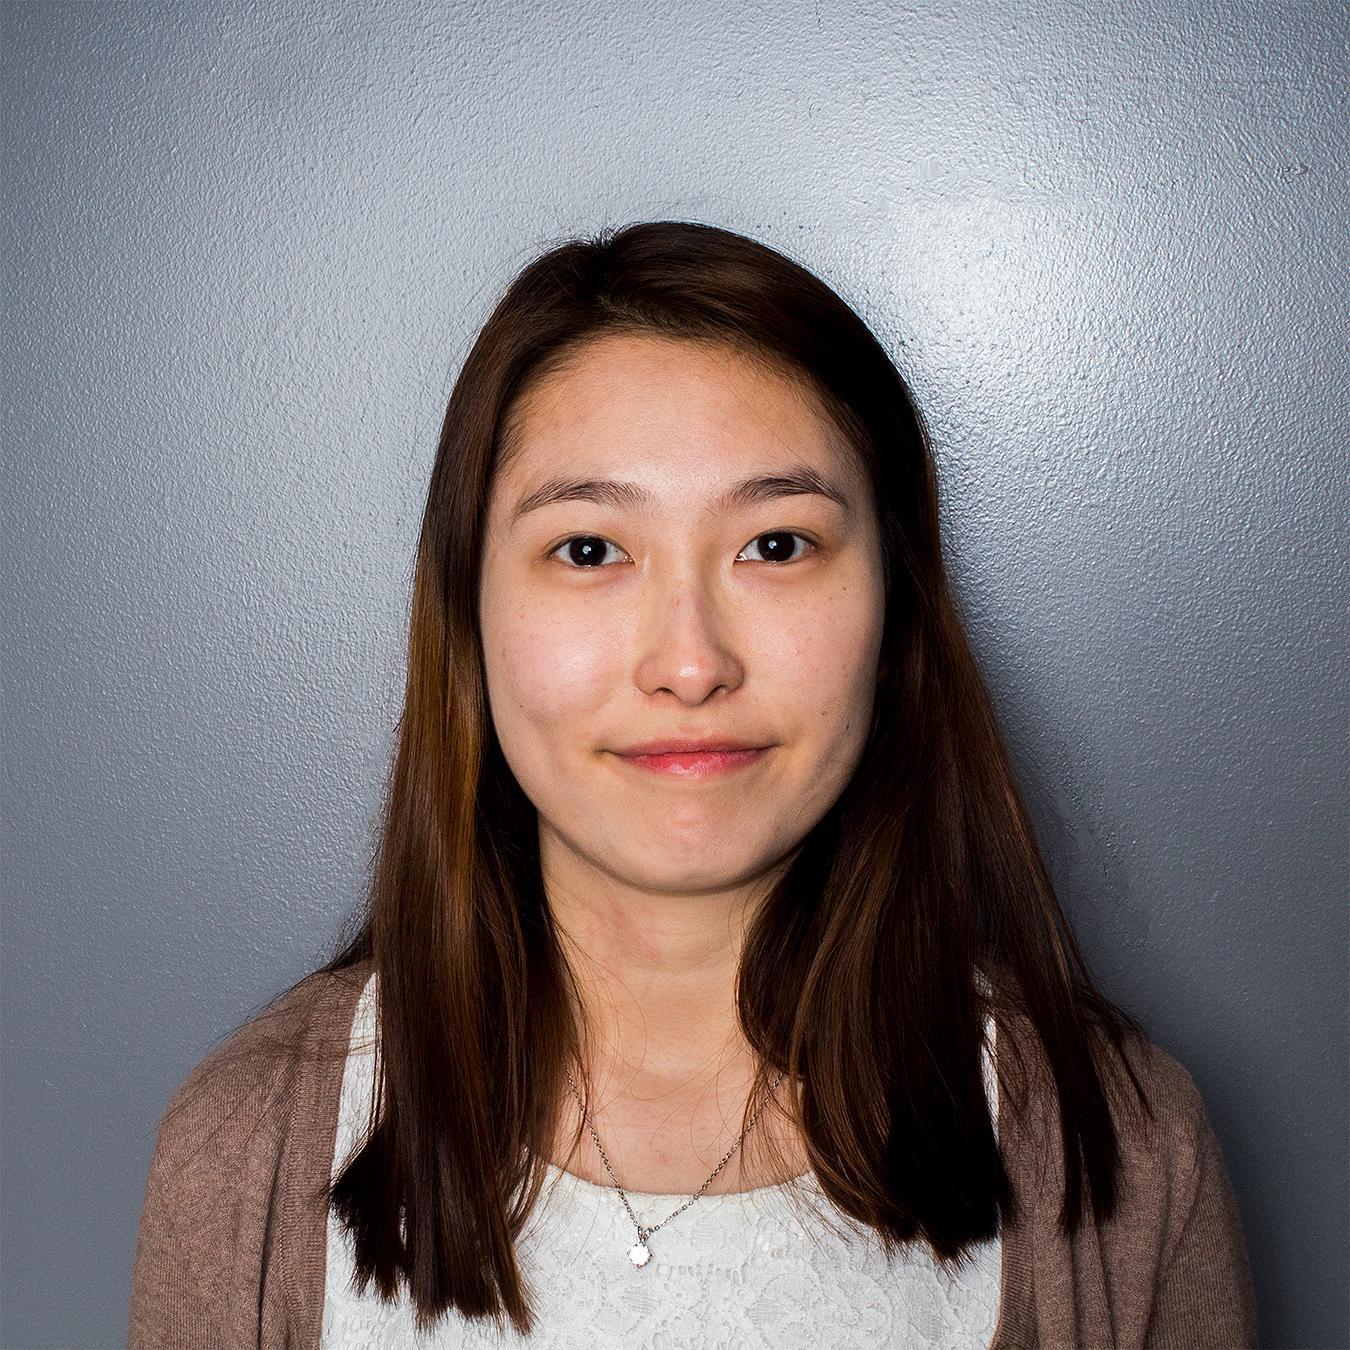 Portrait of Eileen Ko by Grant Wei, Copyright 2018